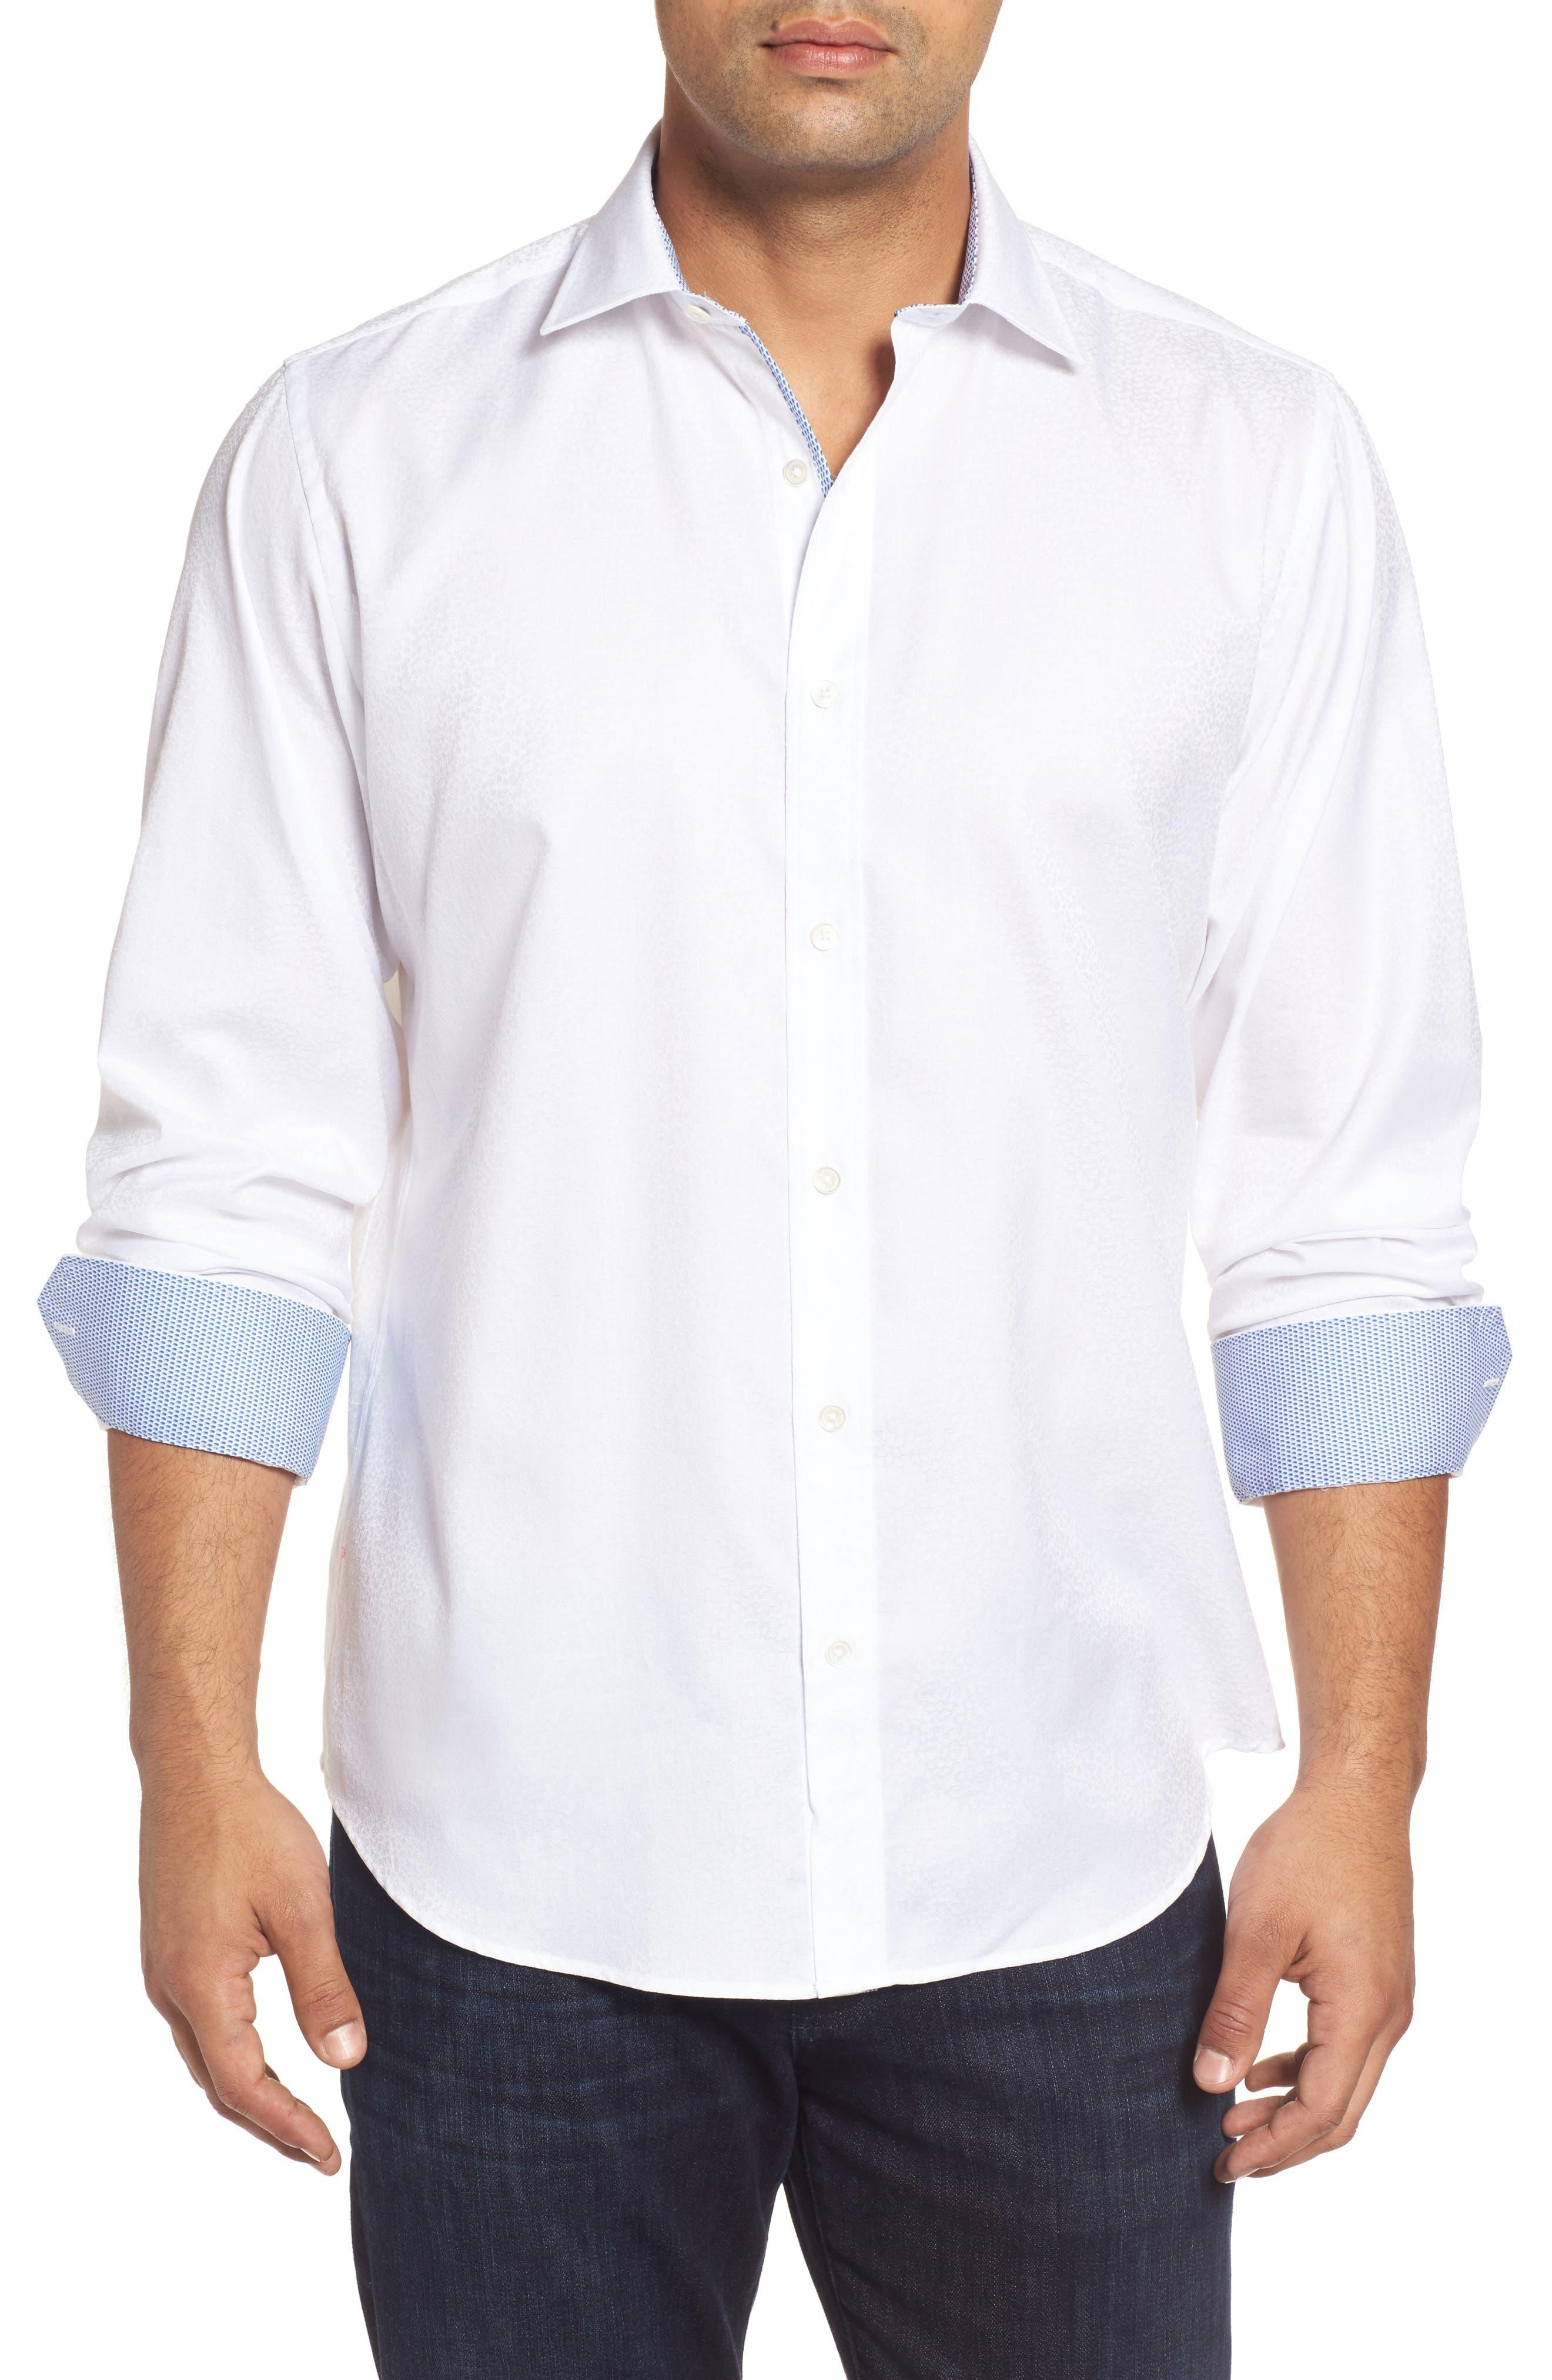 Alternate Image 1 Selected - Bugatchi Classic Fit Floral Jacquard Sport Shirt